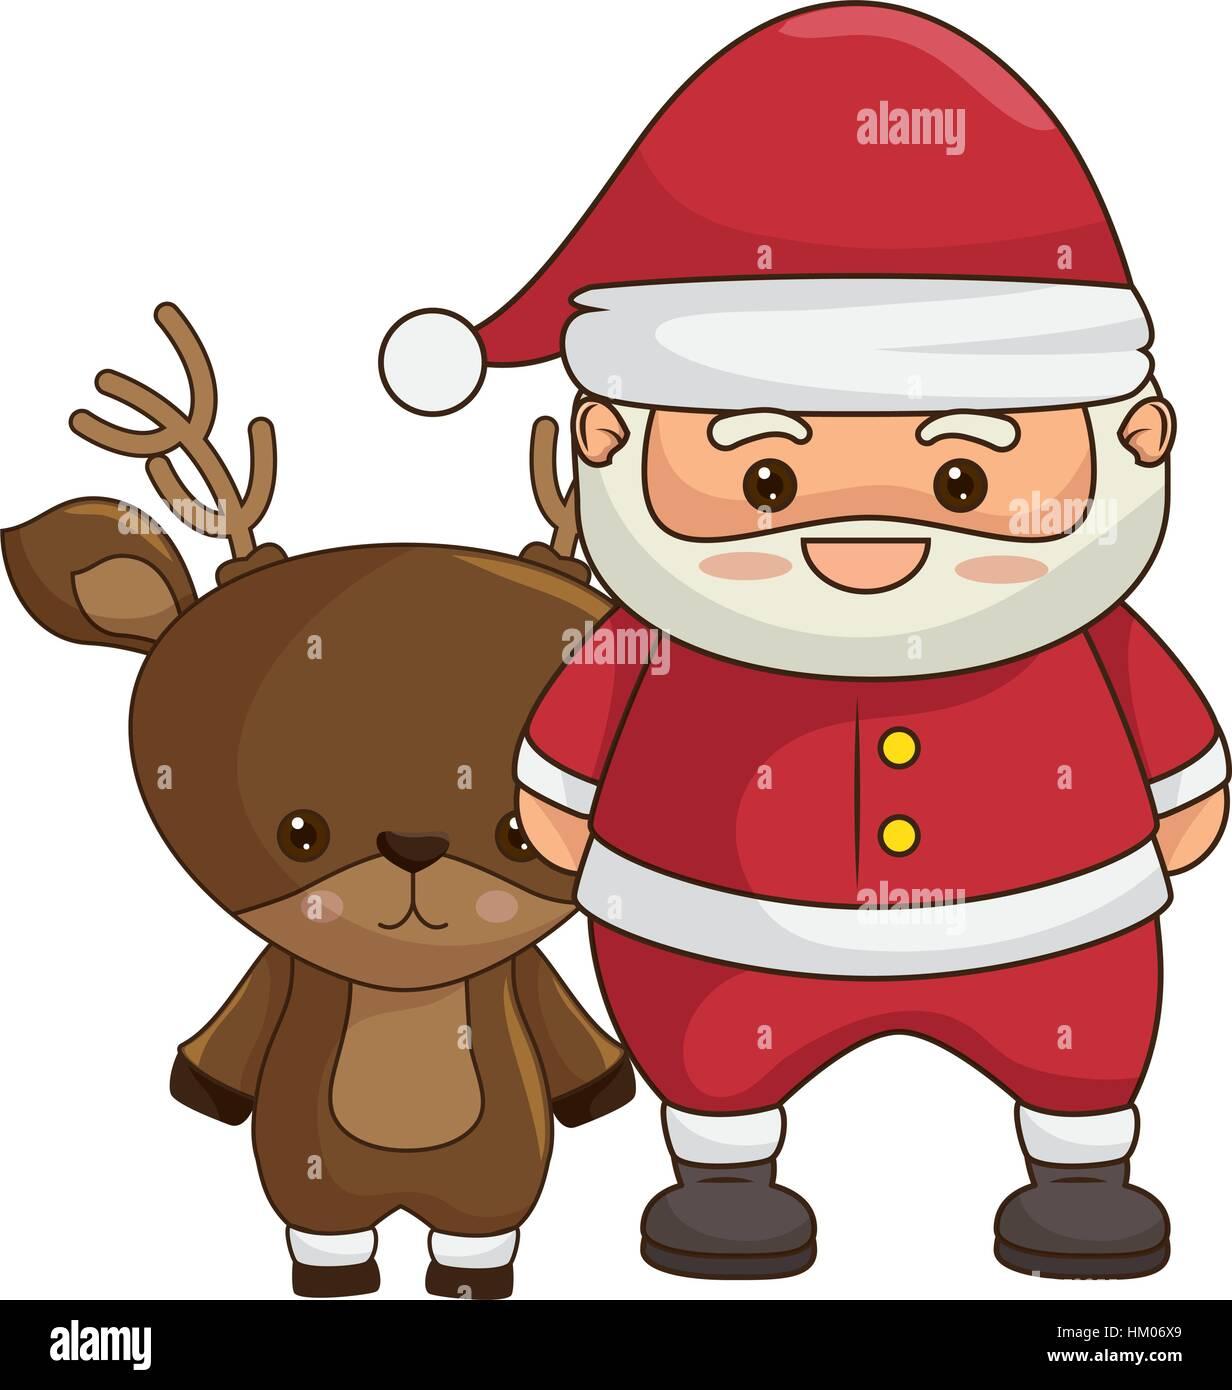 Merry Christmas Santa Claus Kawaii Stock Photos Merry Christmas